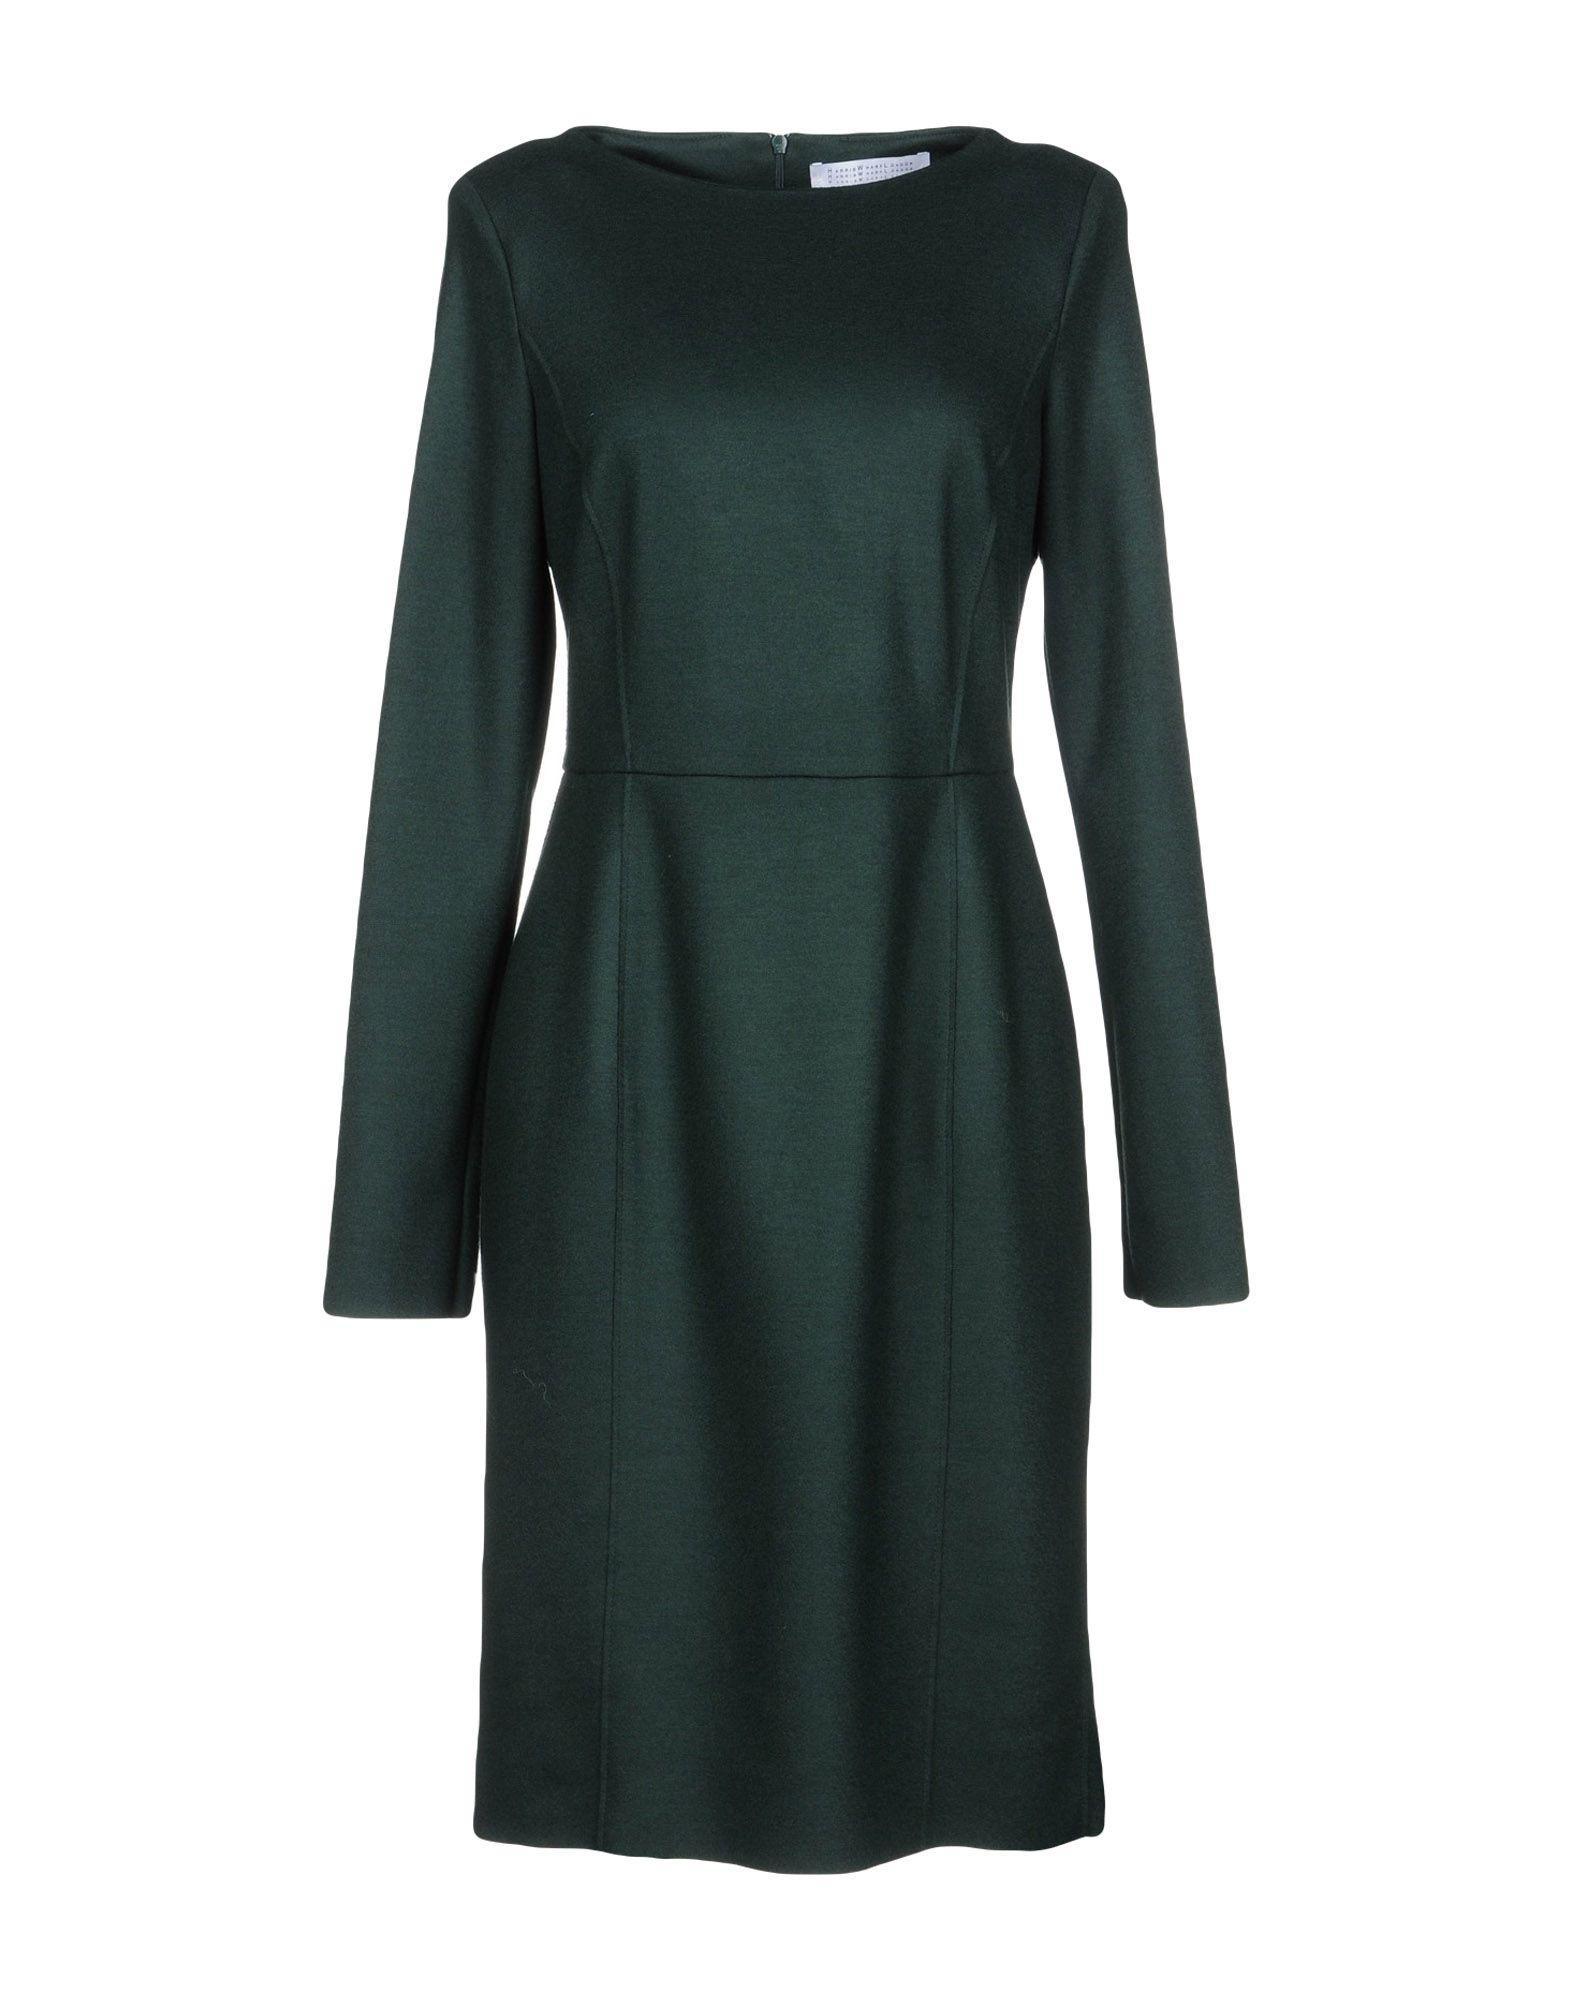 Harris Wharf London Knee-length Dress In Dark Green